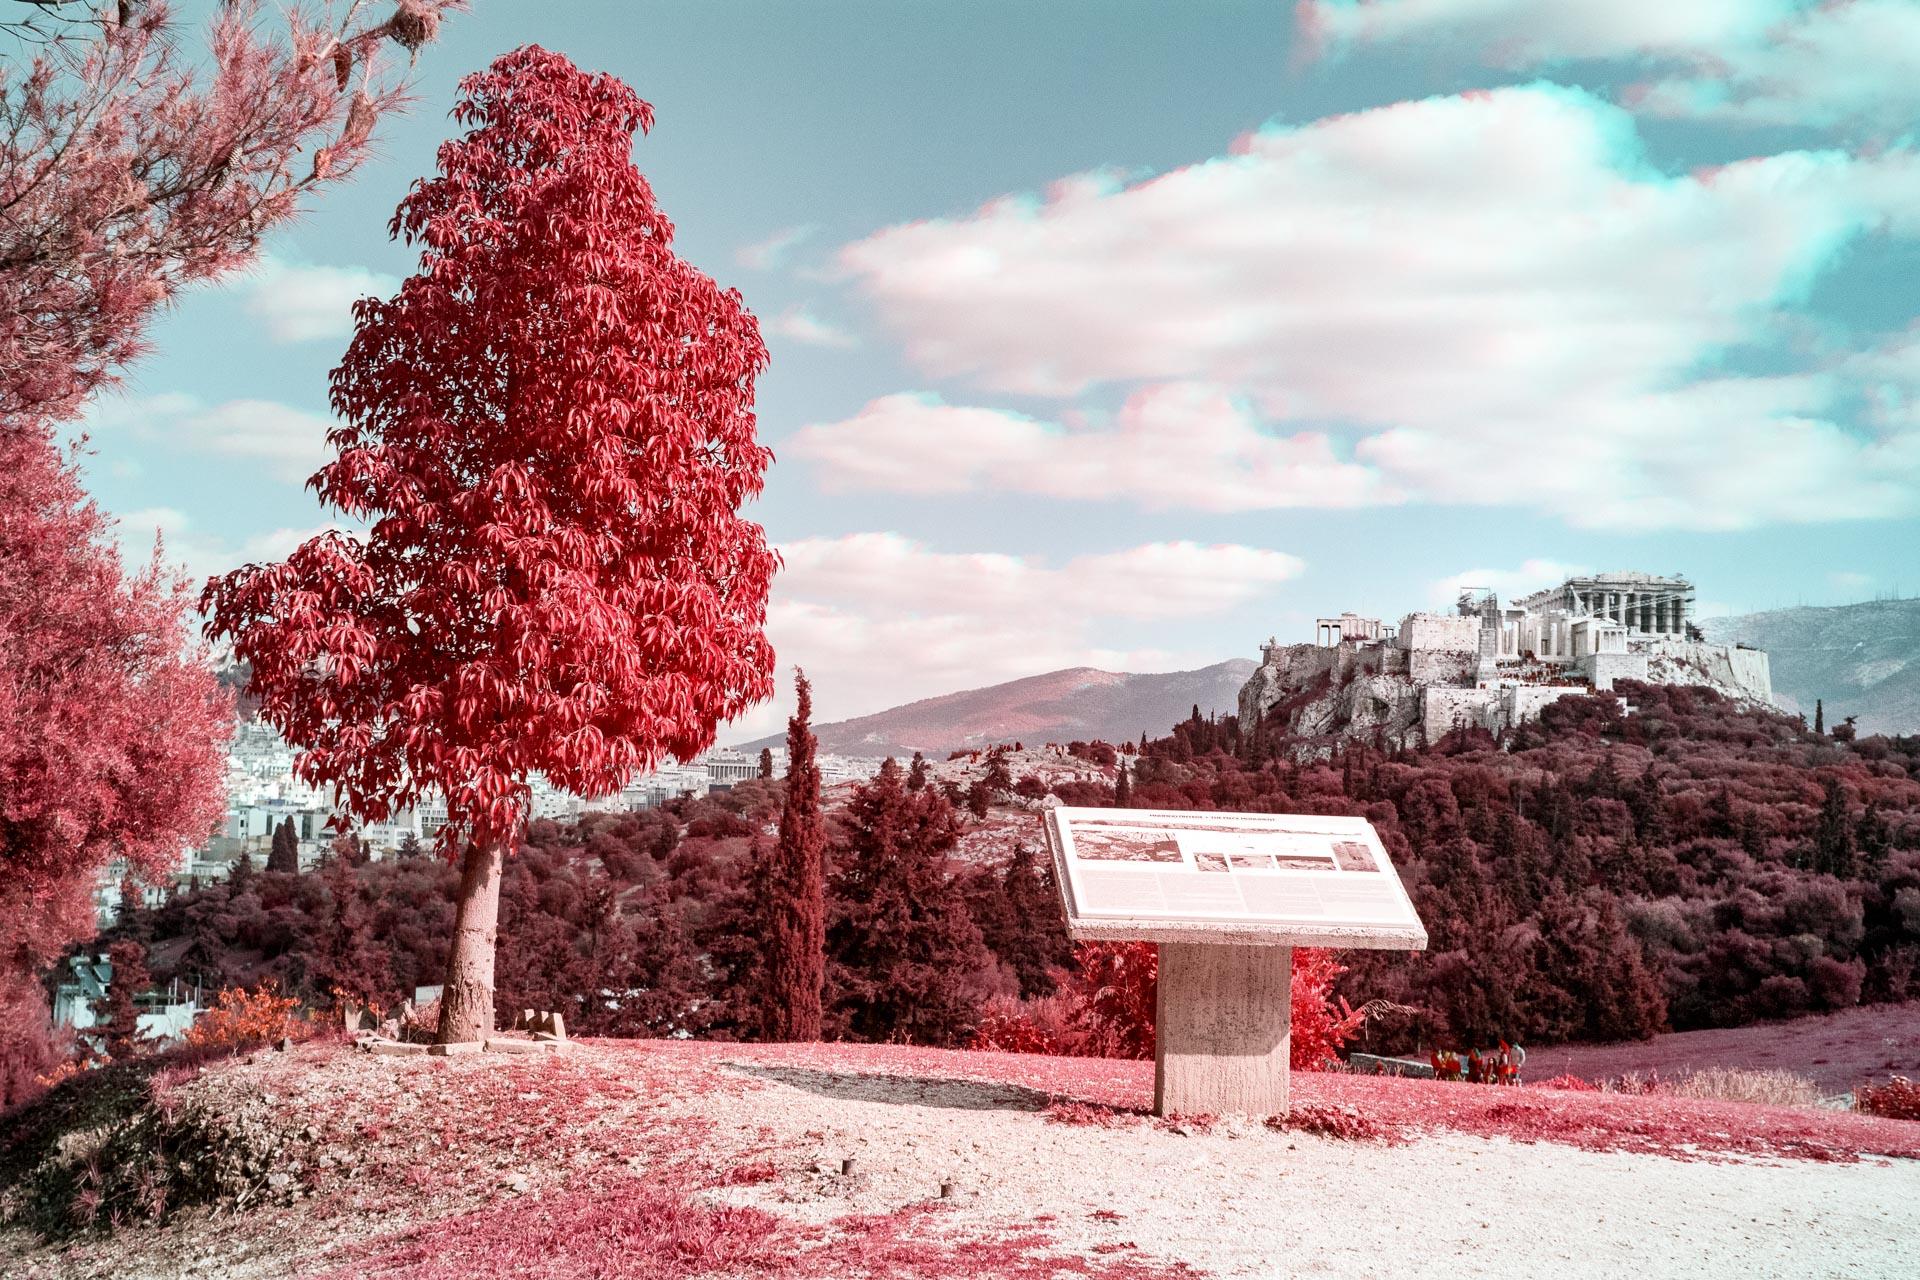 Infrared Trichrome